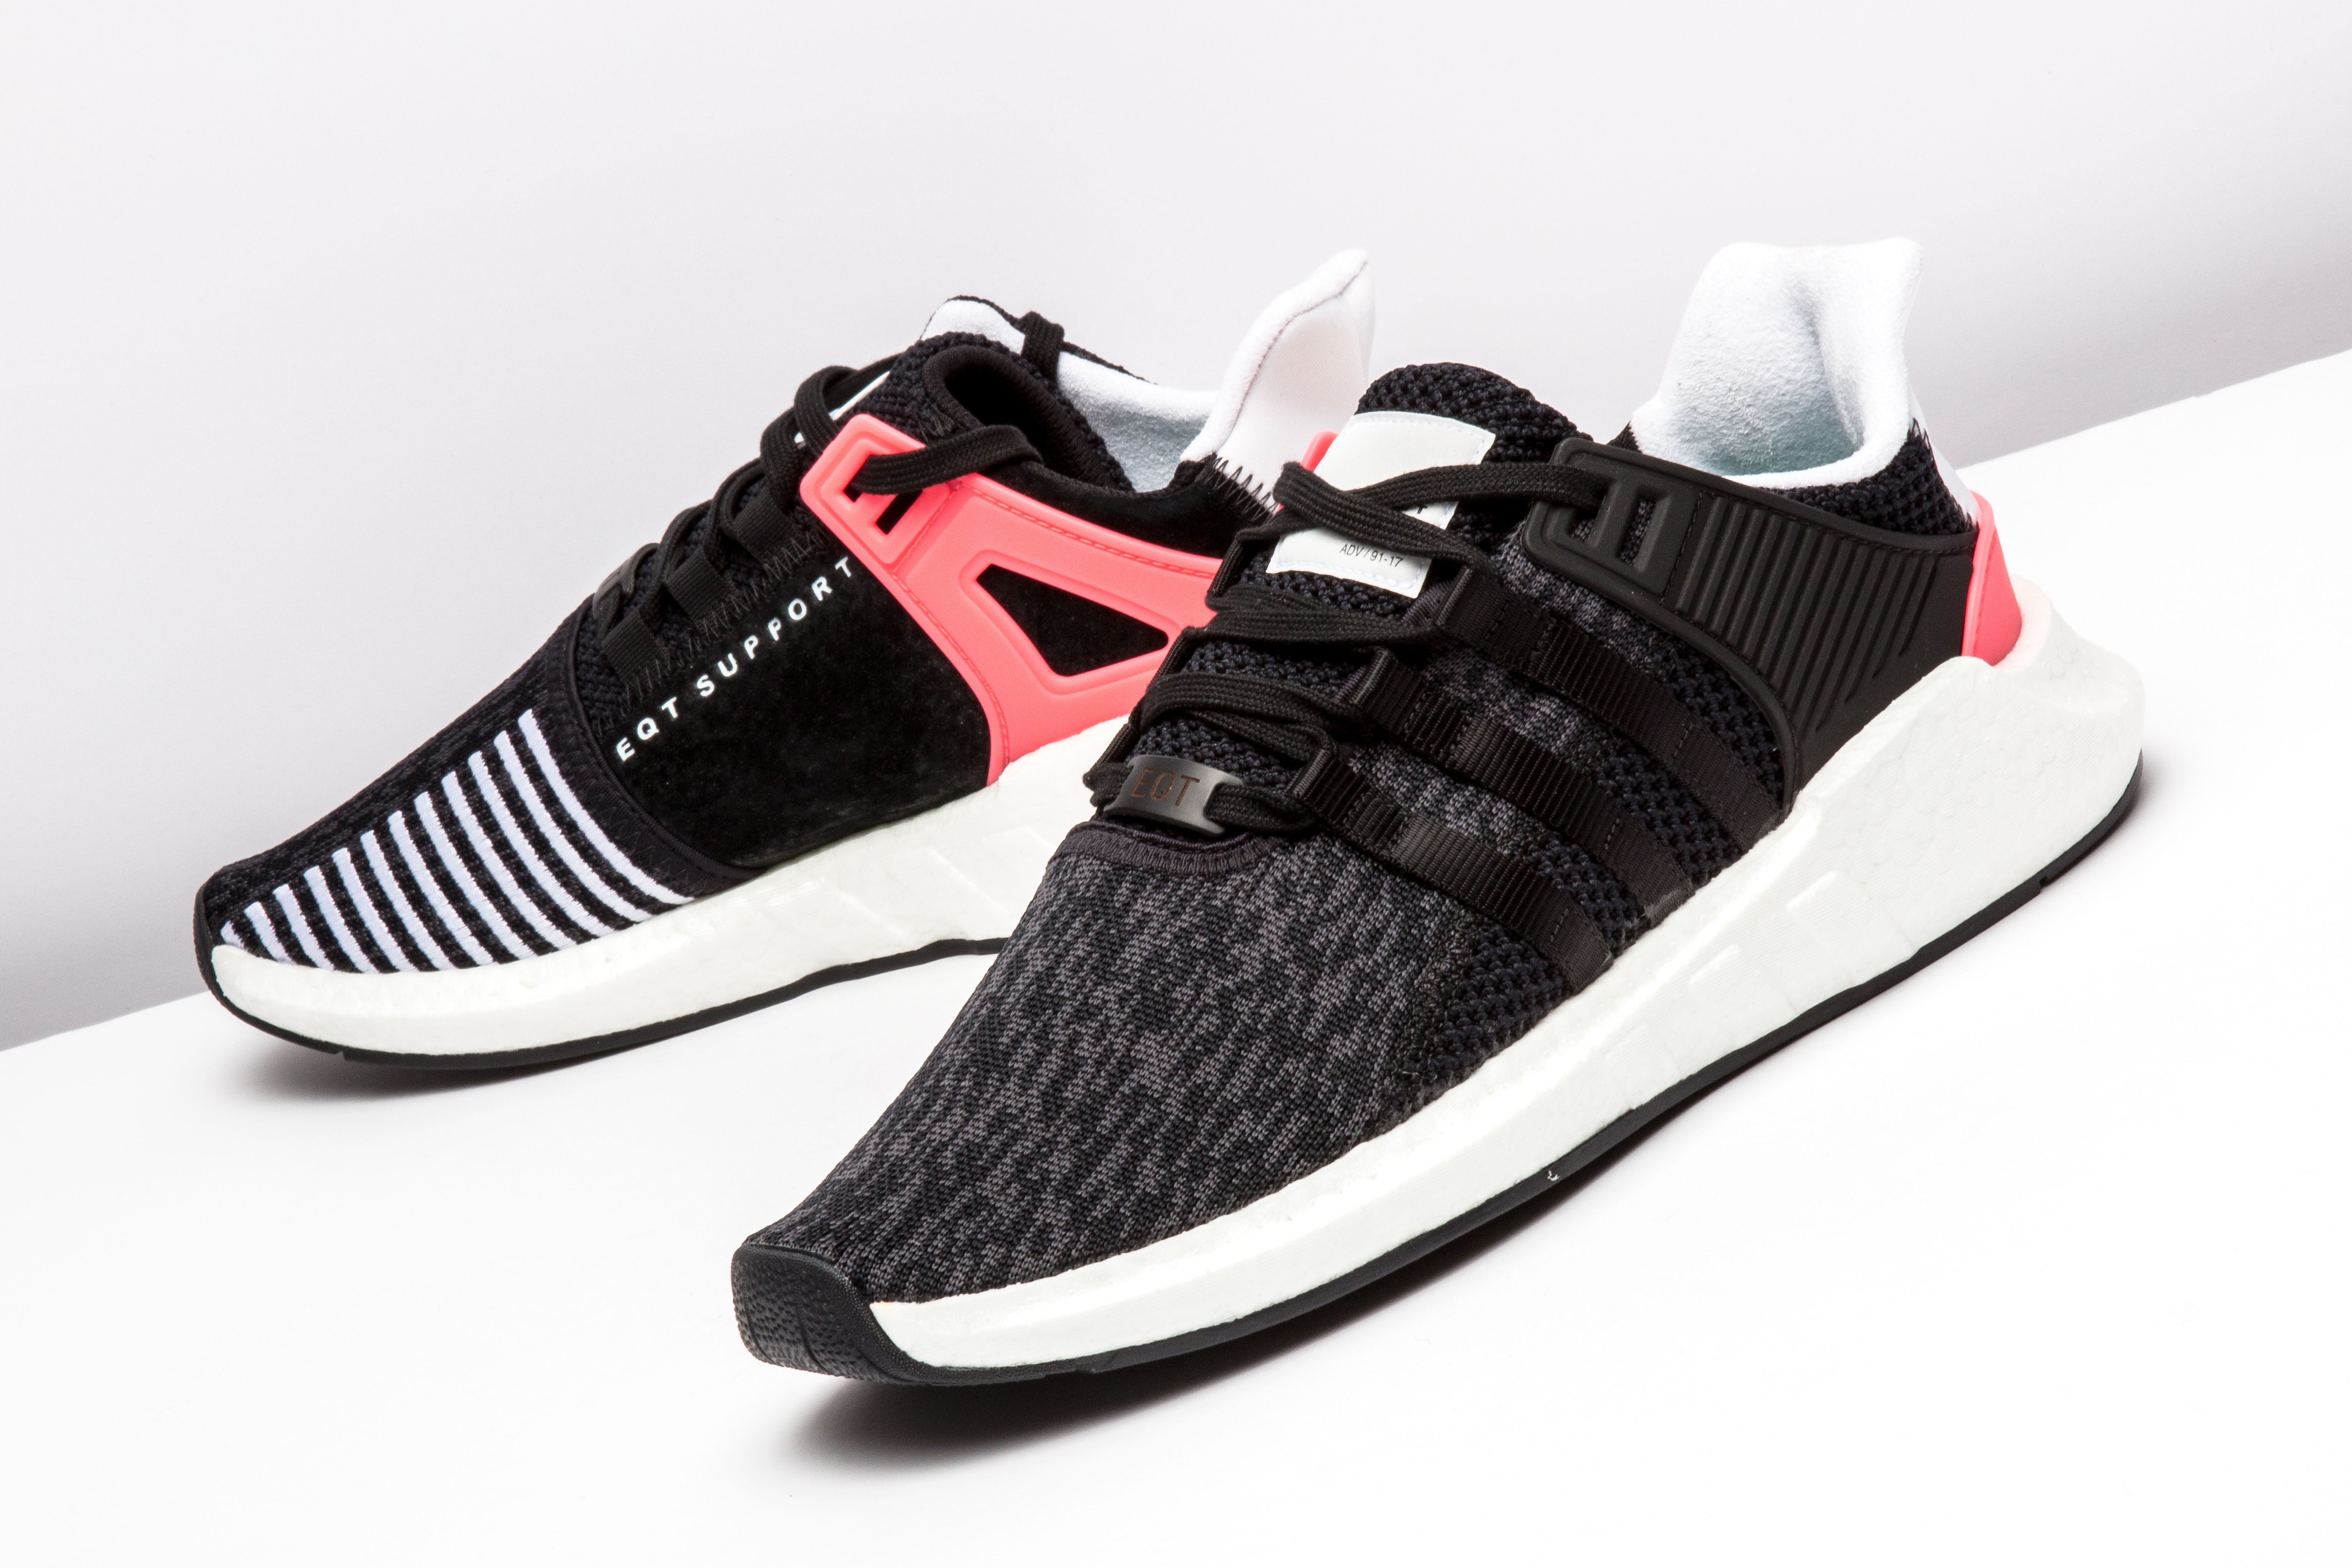 adidas Originals EQT Support RF Men's Running Shoes Light